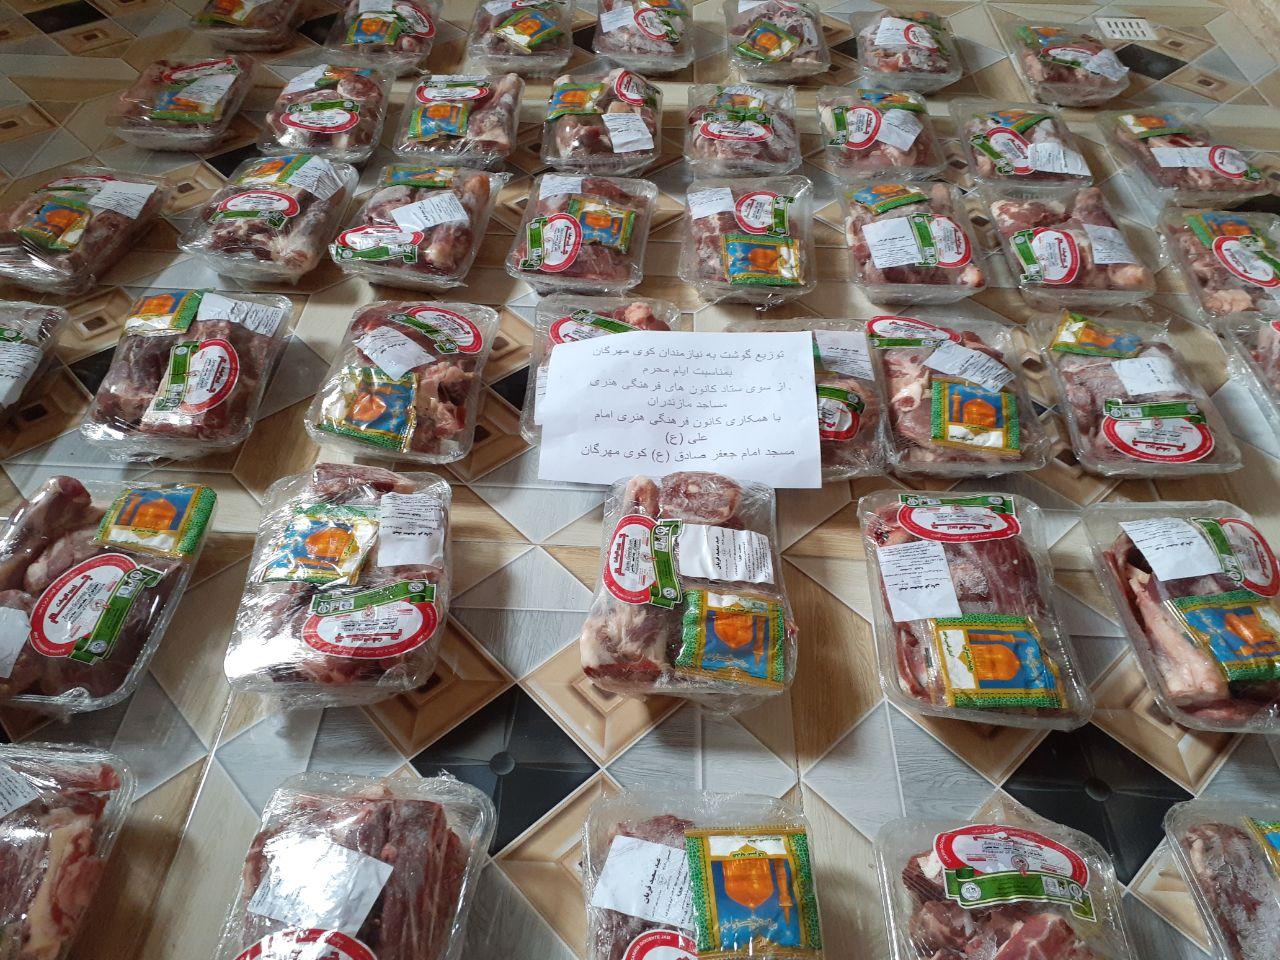 IMG 20200817 190111 100 - توزیع یکصد بسته گوشت قرمز به همت کانون مسجد امام علی(ع) نکا در محرم